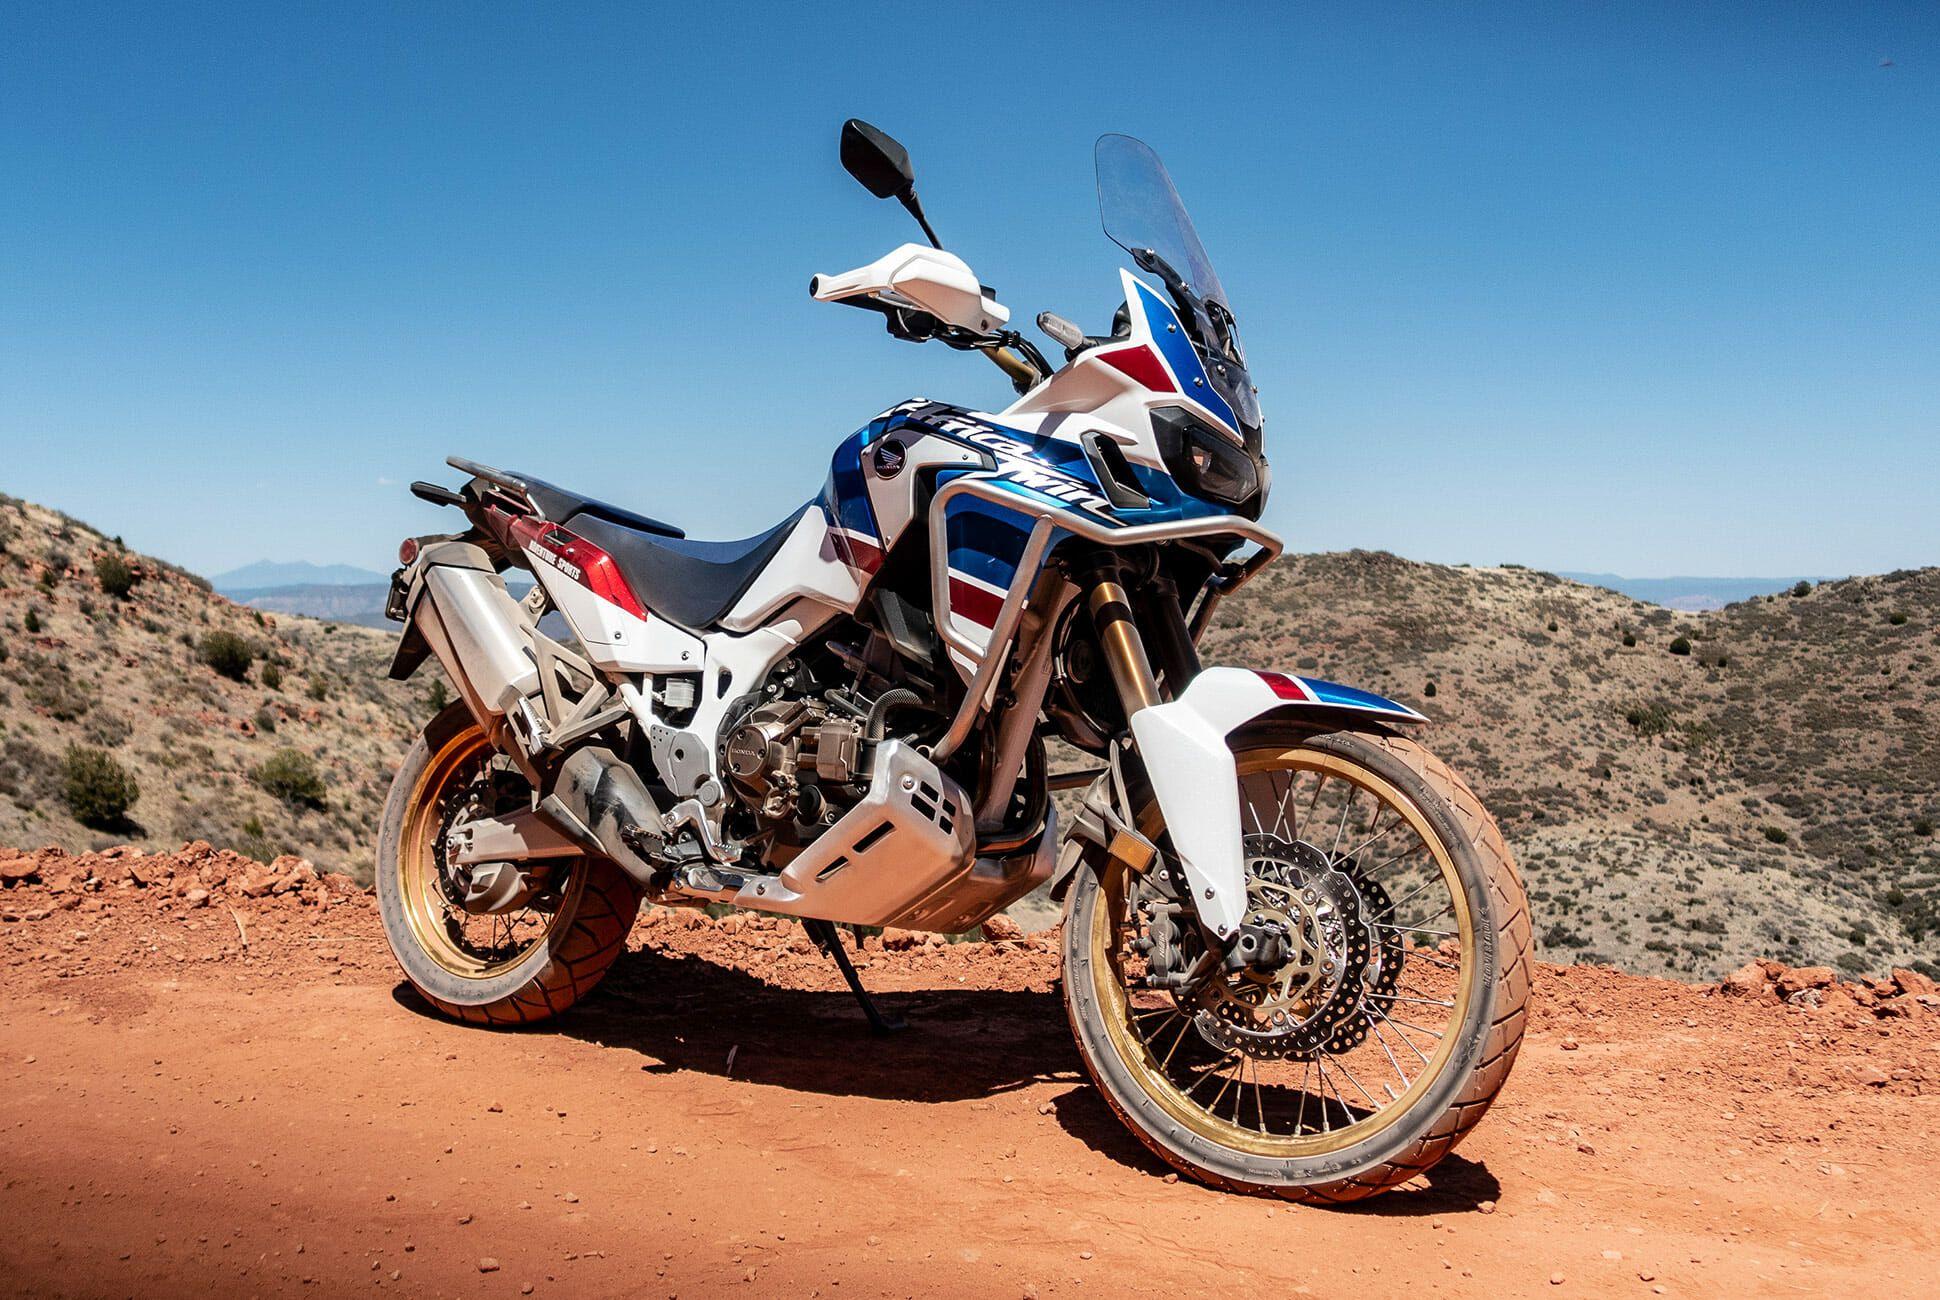 2018-Honda-Africa-Twin-Review-gear-patrol-slide-1